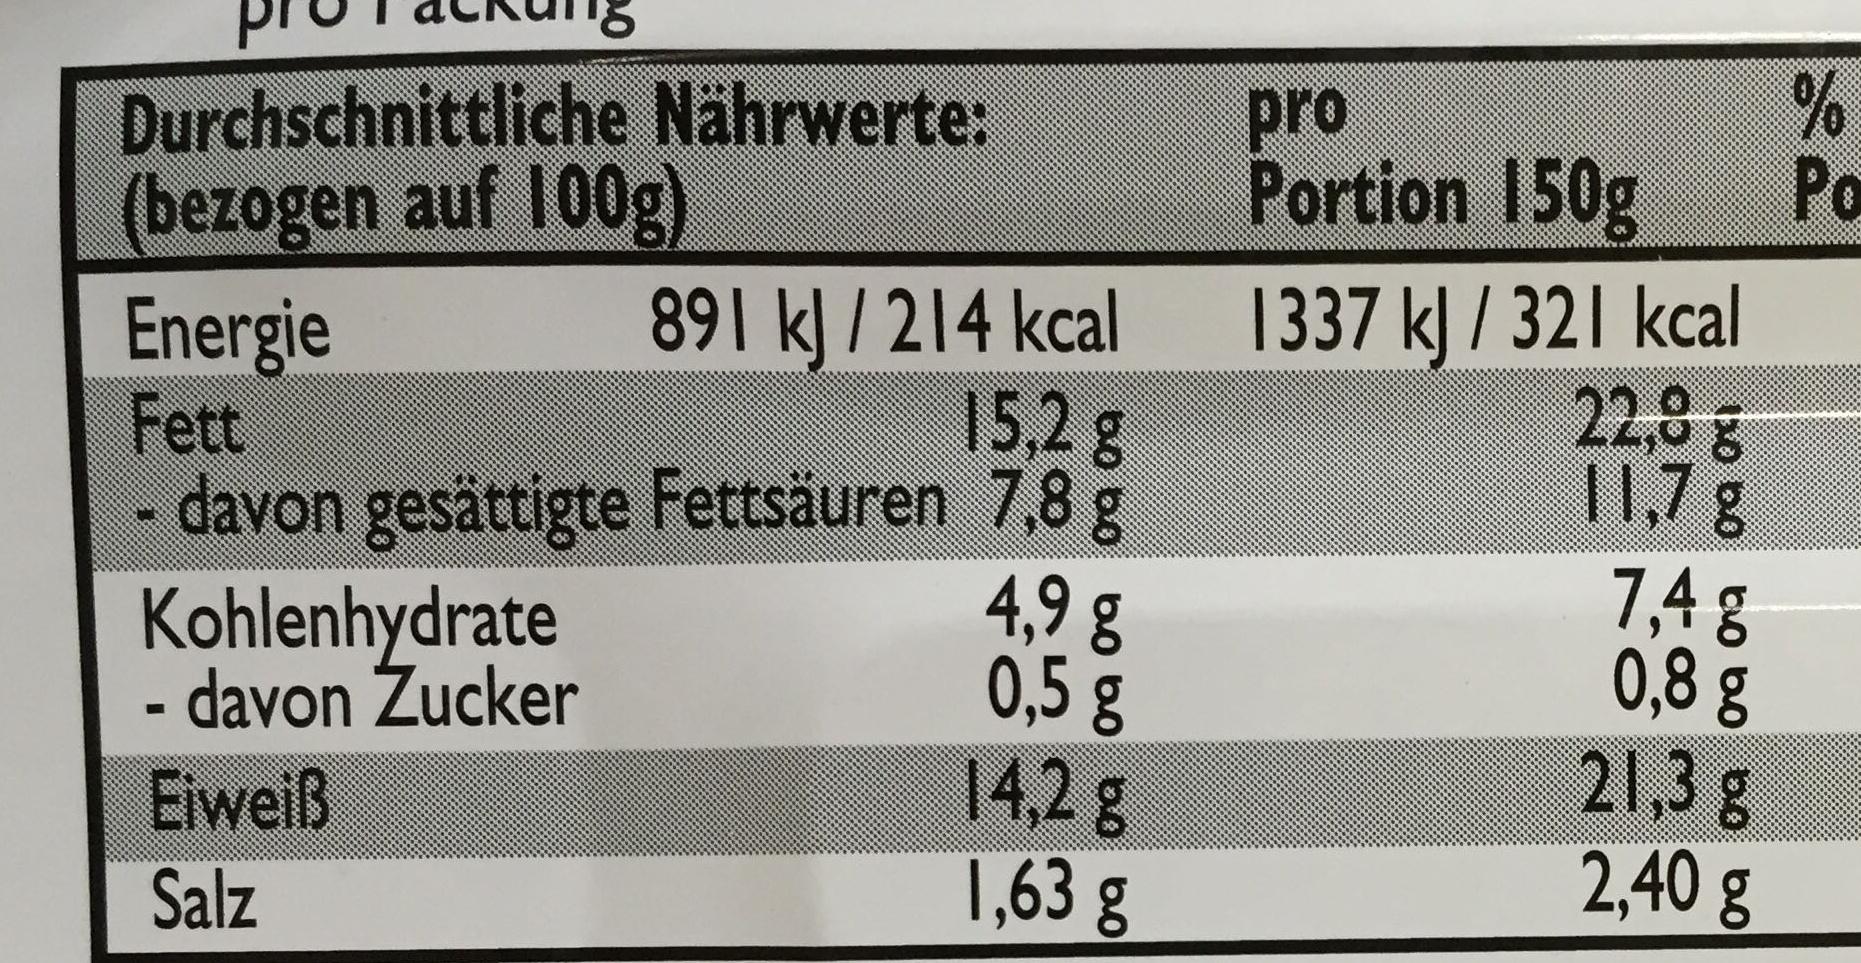 Bratheringe in feinwurziger marinade - Informations nutritionnelles - fr